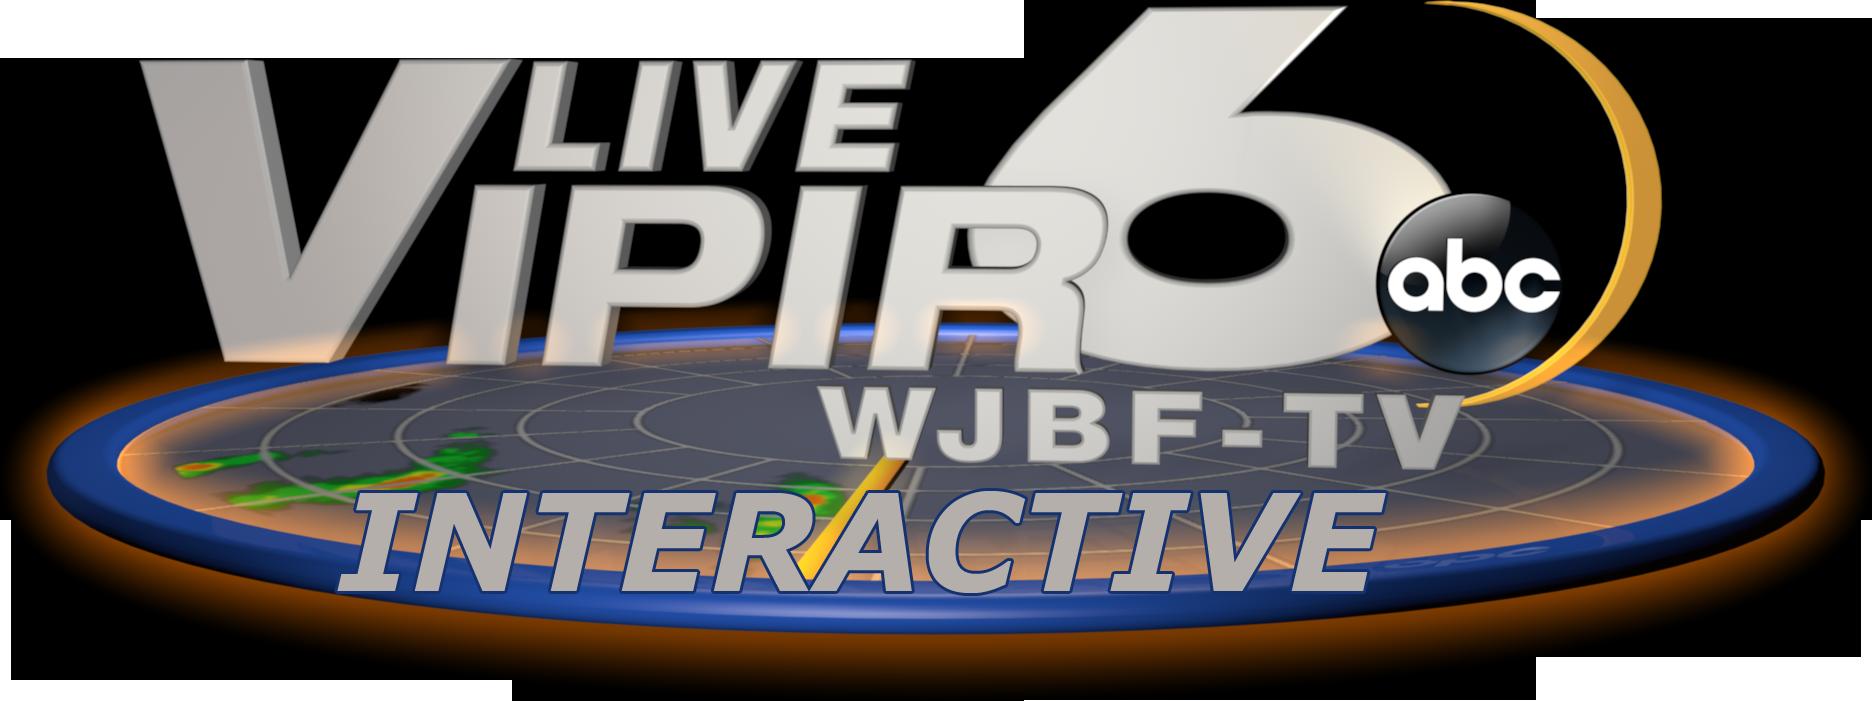 Live Interactive VIPIR Radar | WJBF